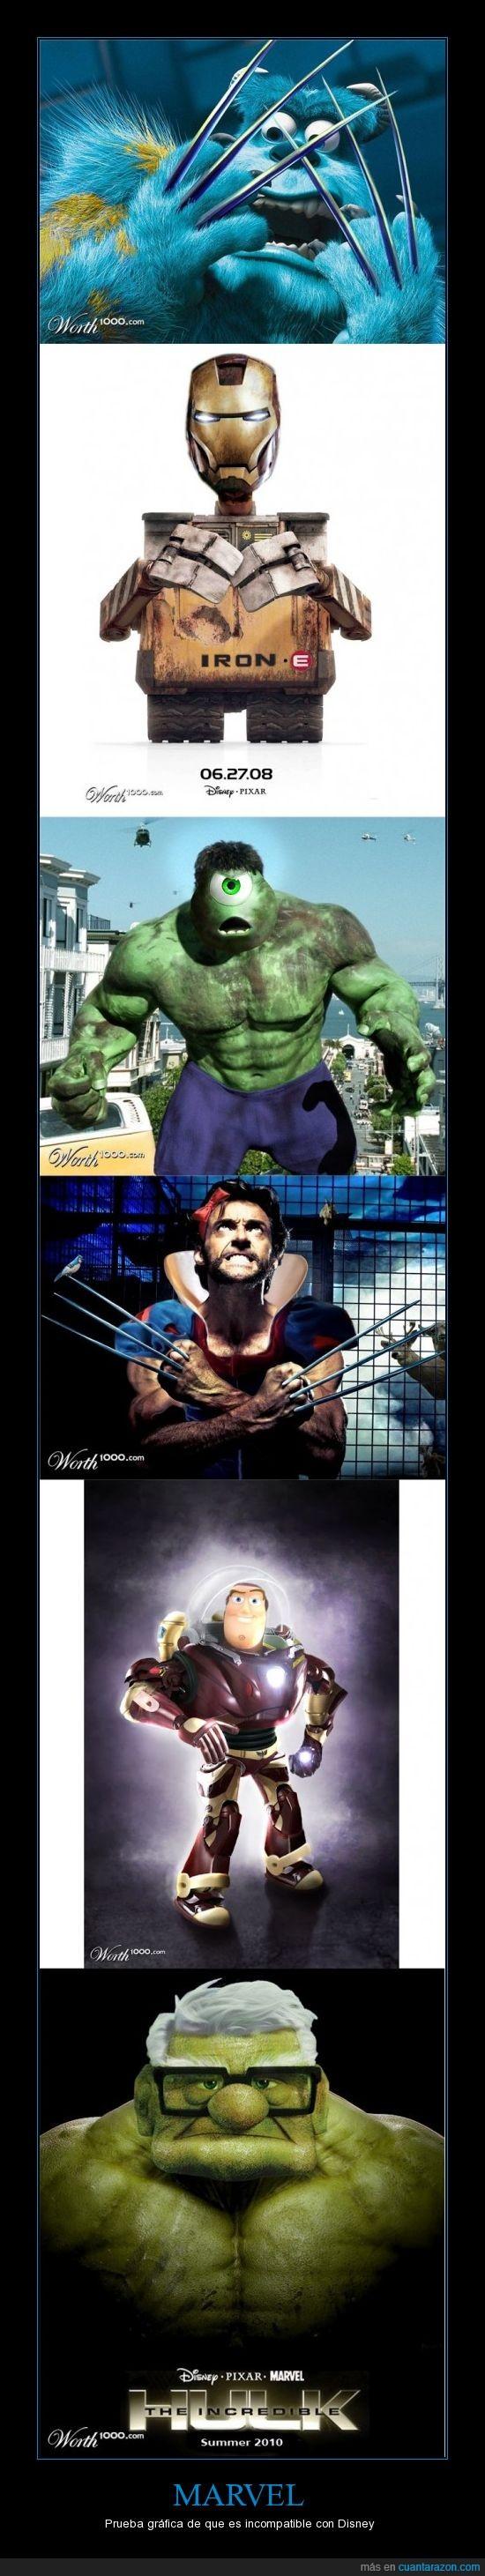 Disney,evolución,heroes,hulk,Marvel